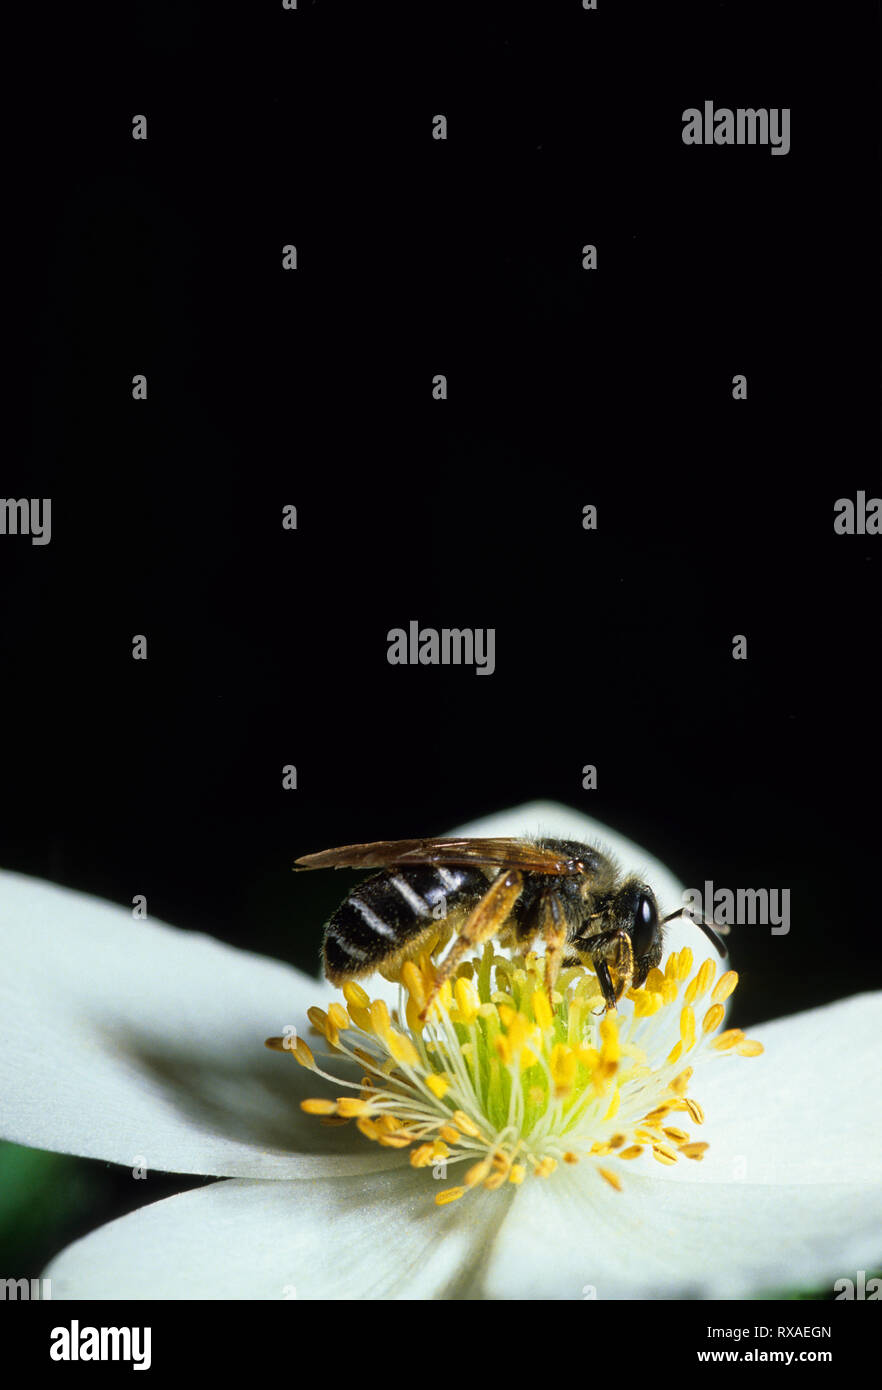 Halictid sweat bee on Canada anemone, Saskatchewan, Canada - Stock Image